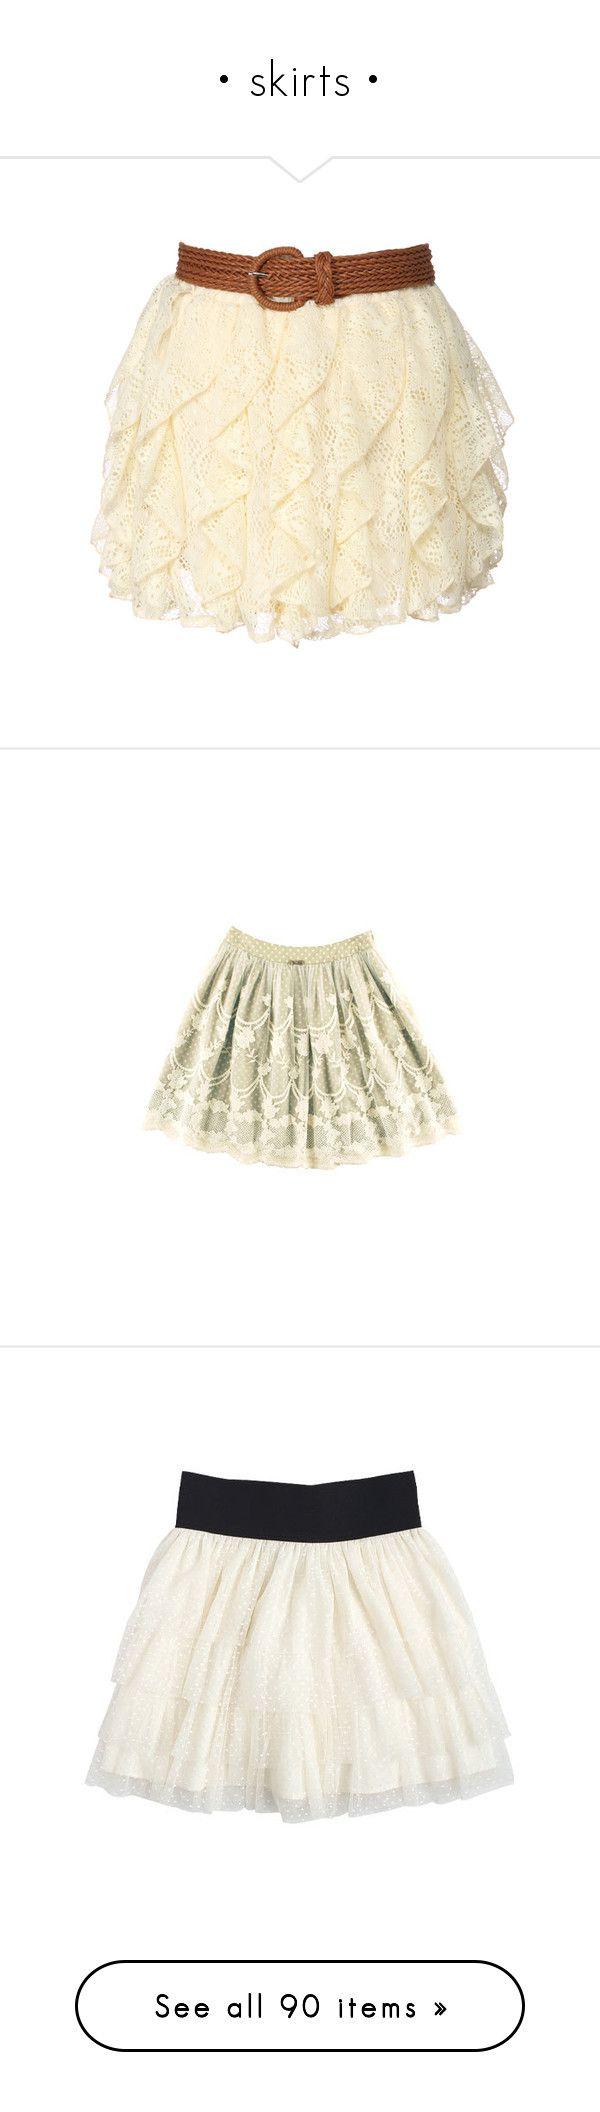 """• skirts •"" by hollamika ❤ liked on Polyvore featuring skirts, mini skirts, bottoms, saias, faldas, women, beige skirt, crochet mini skirt, macrame skirt and beige crochet skirt"